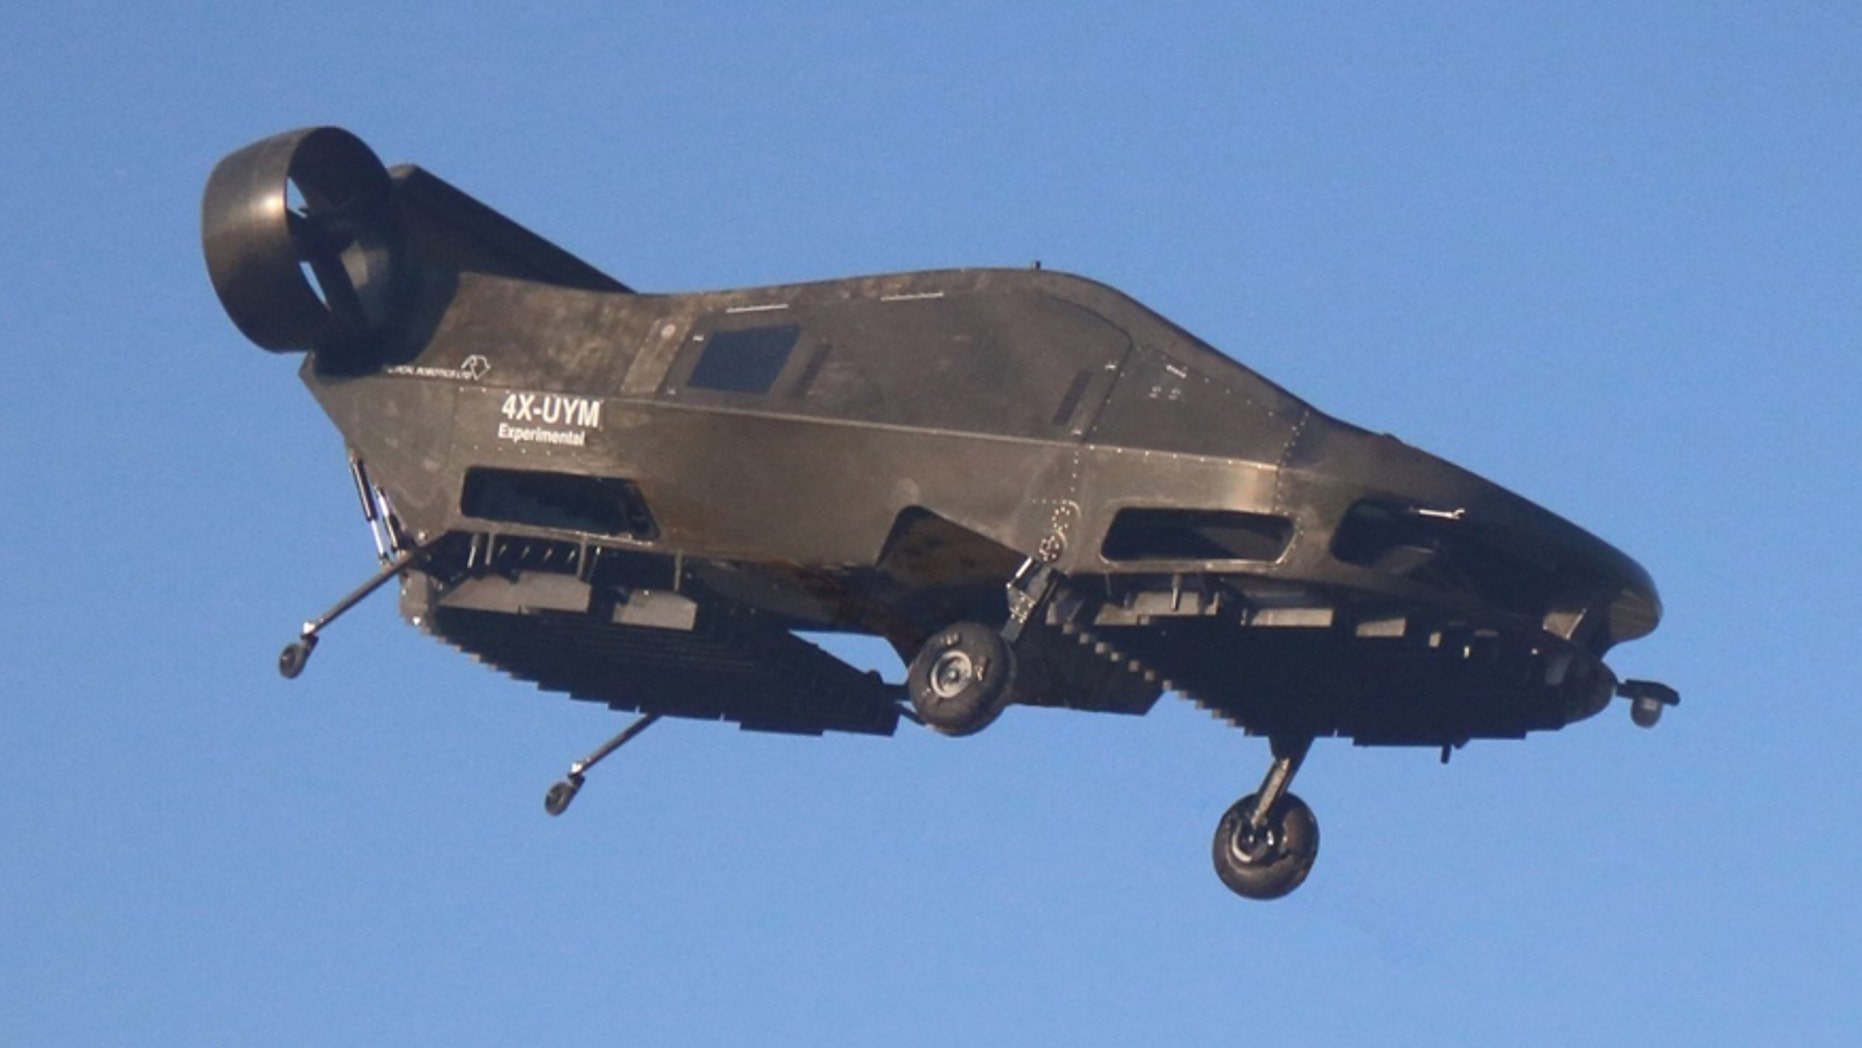 This image provided by Urban Aeronautics/Tactical Robotics shows an Israeli-made flying car. Urban Aeronautics conducted flight tests of its passenger-carrying drone call the Cormorant.